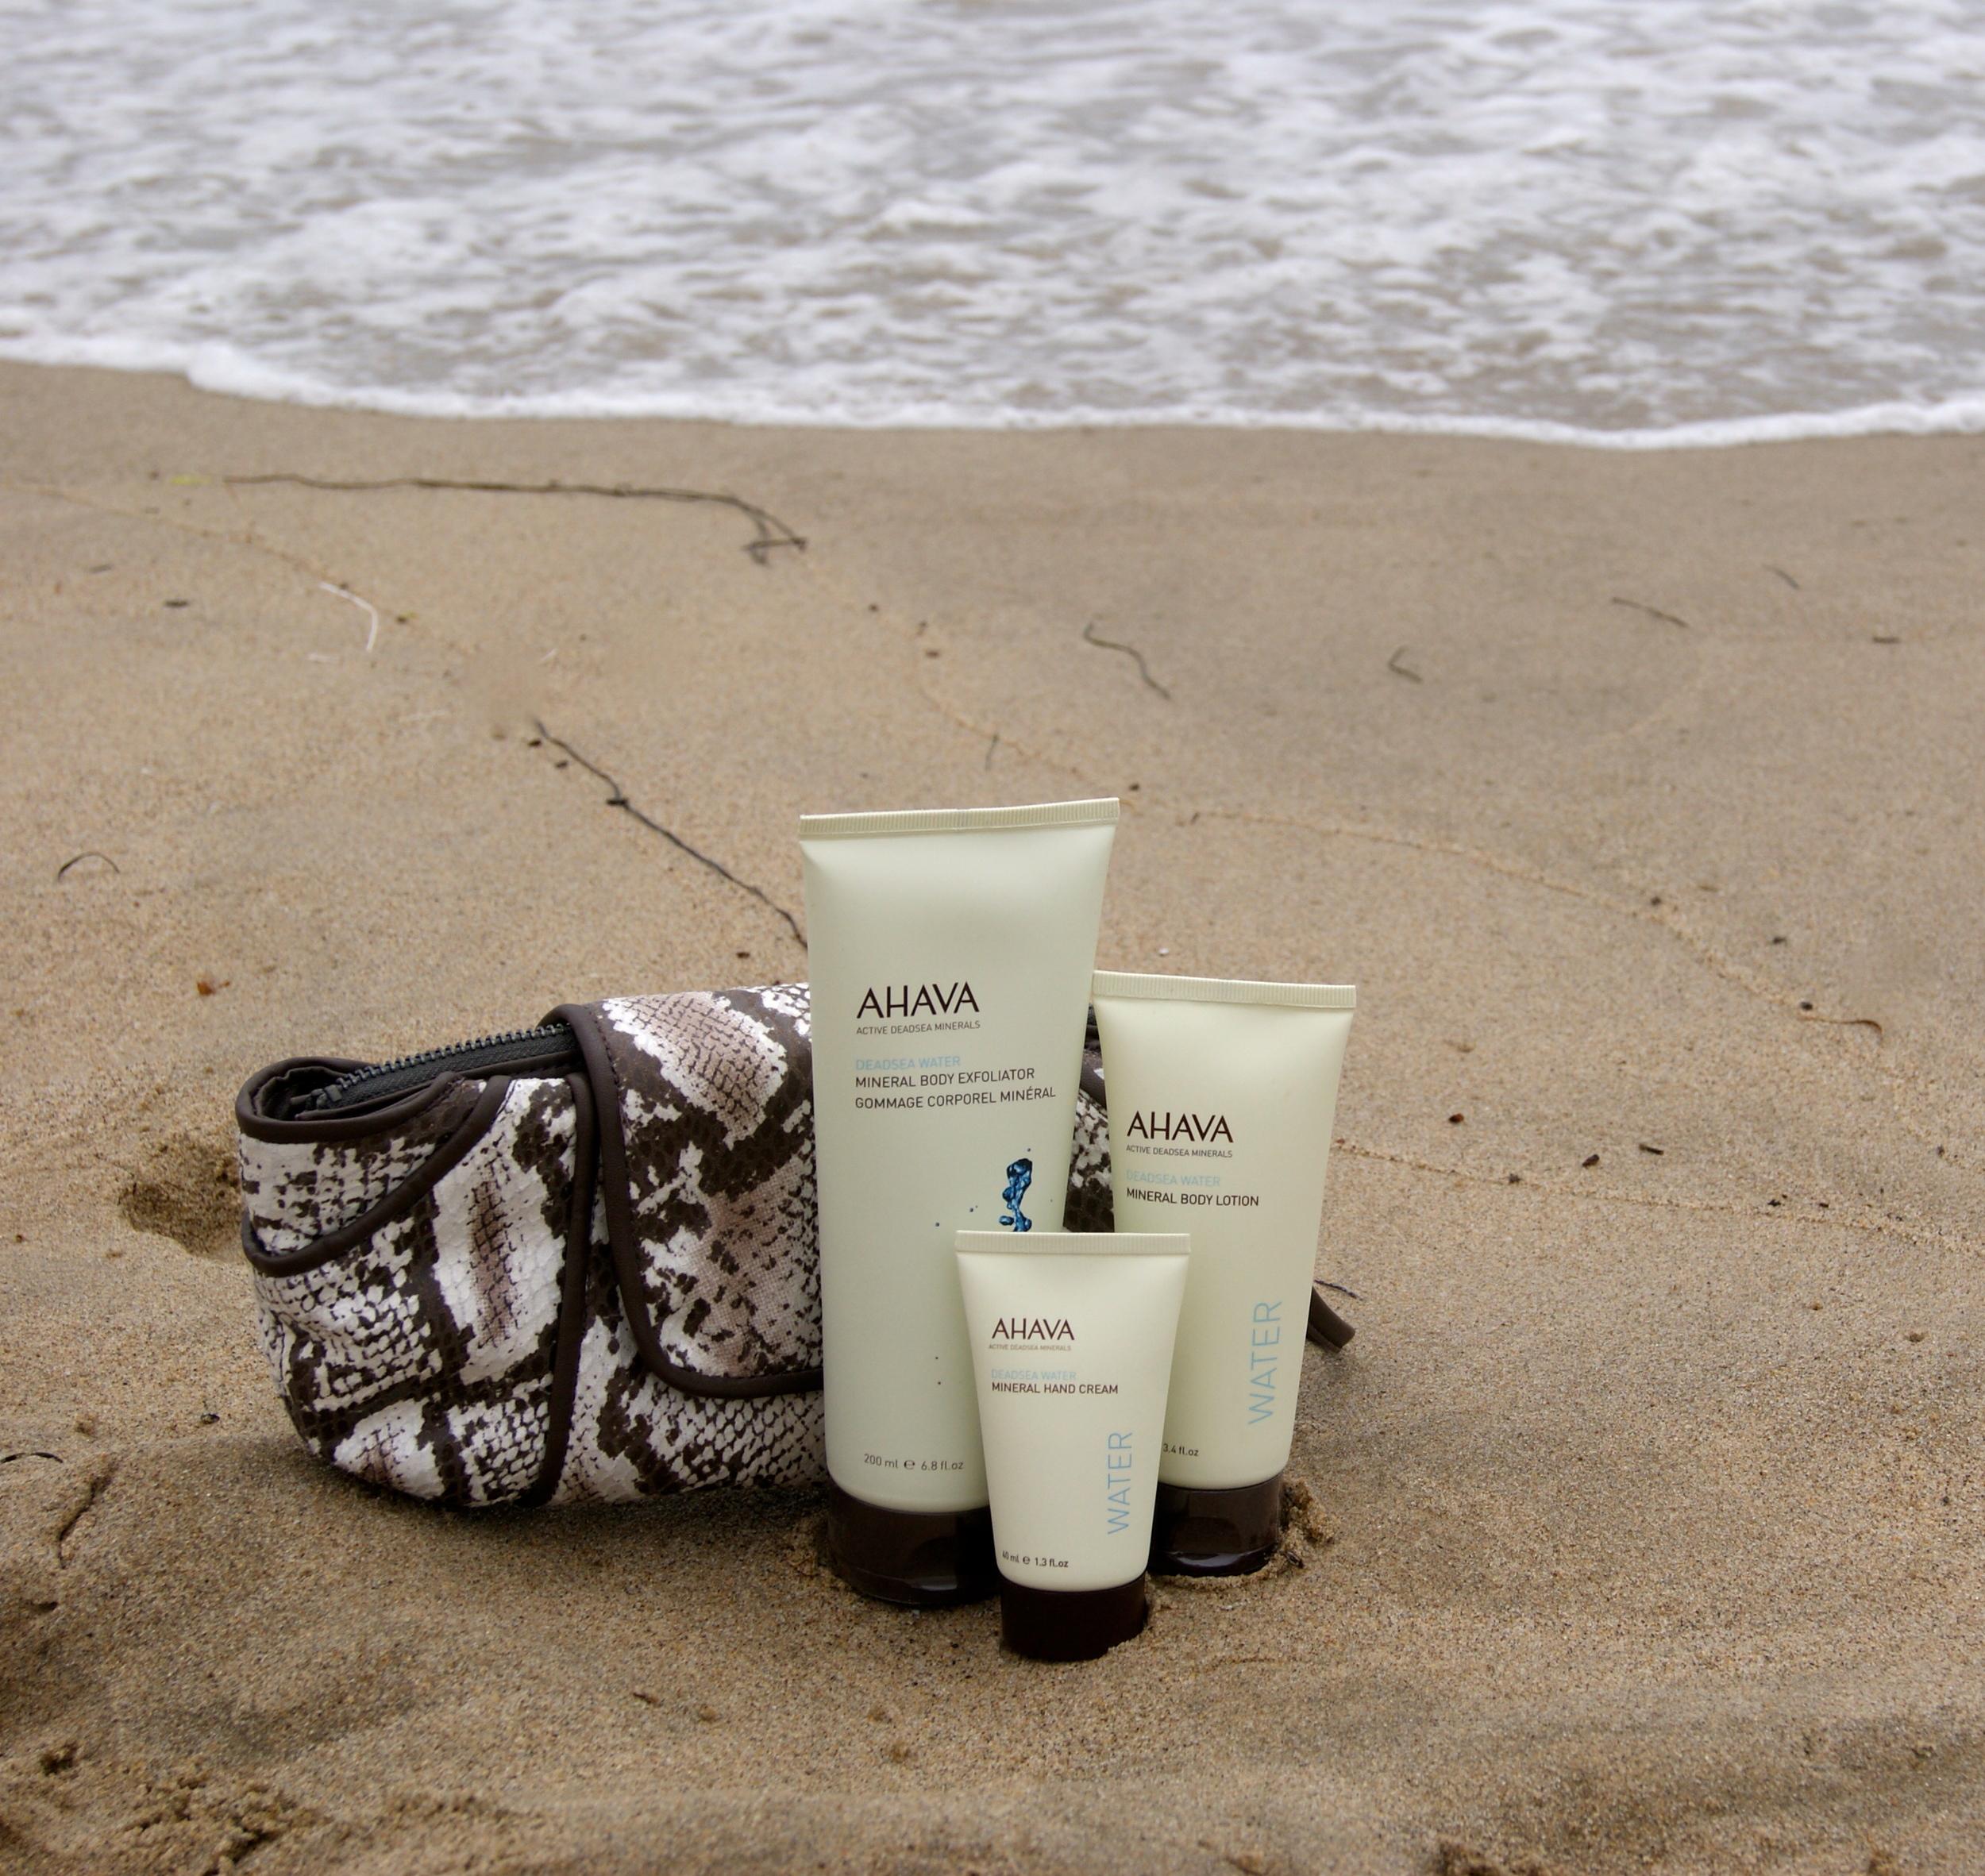 Kooba for AHAVA Limited Edition Set  photographed at Santa Monica beach in Los Angeles, CA.